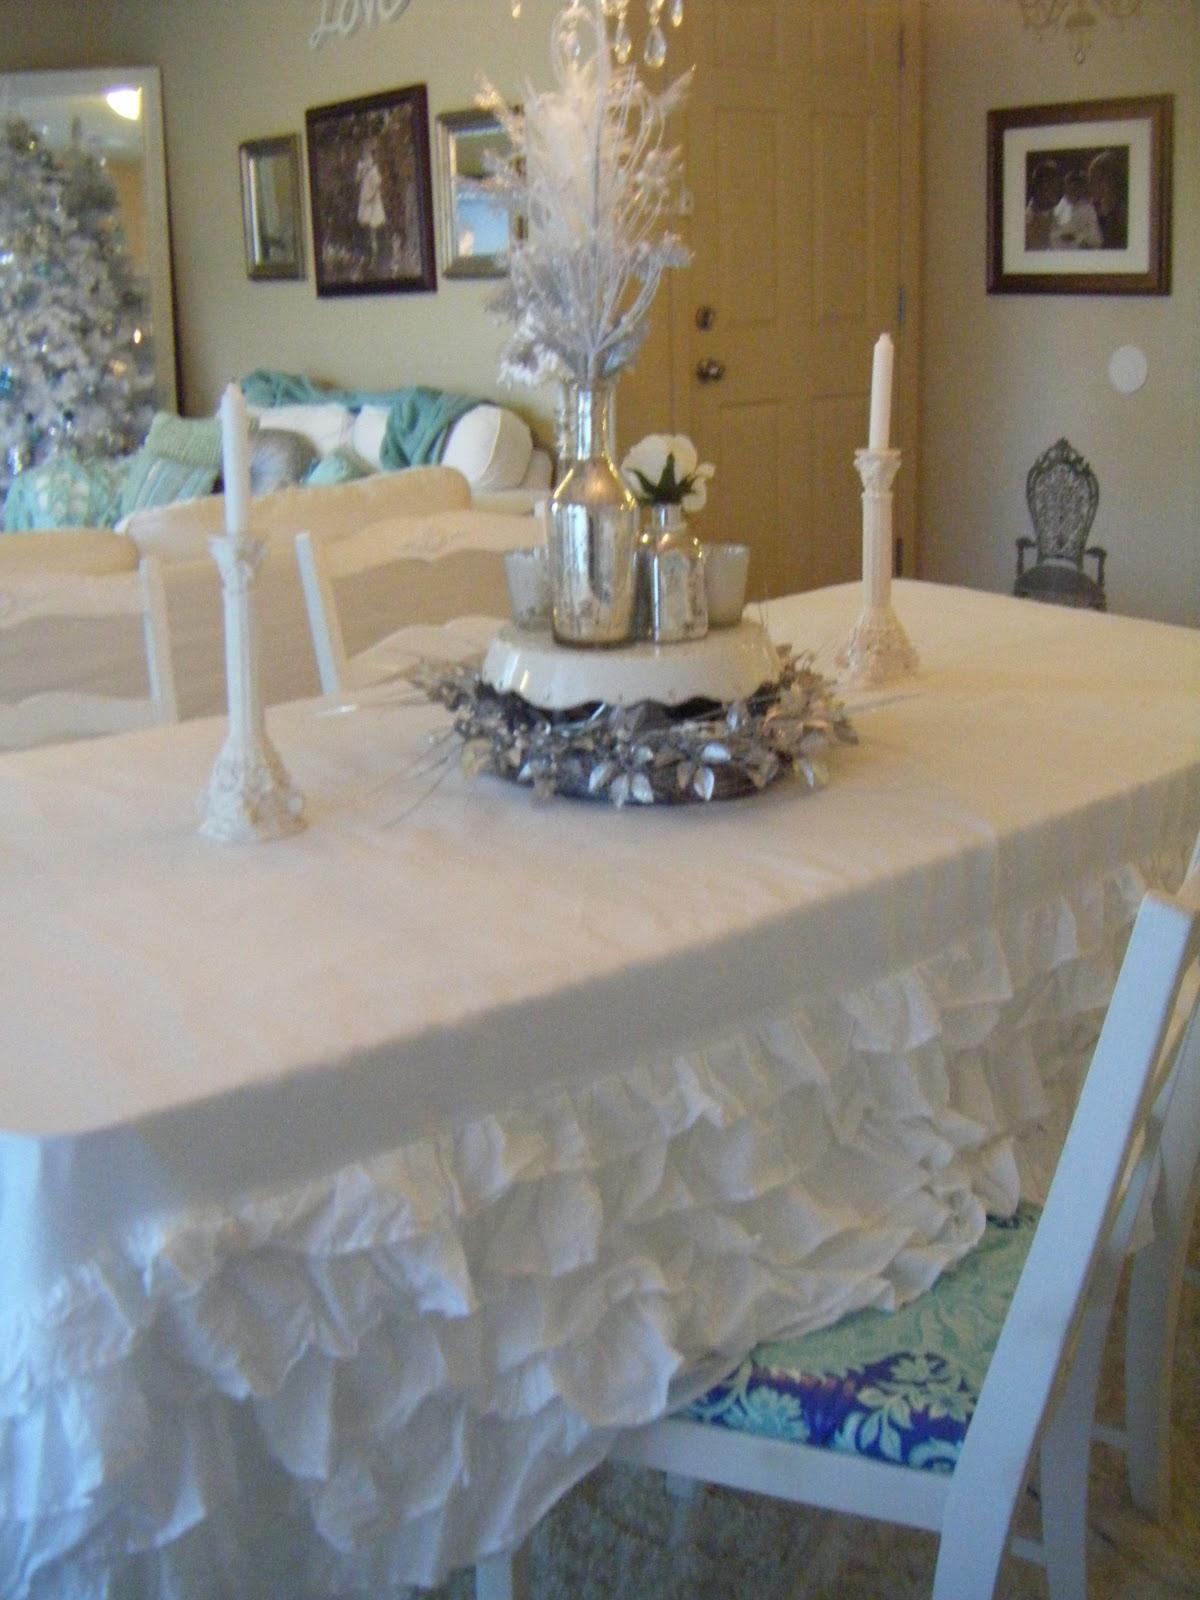 My Ruffled Table Cloth